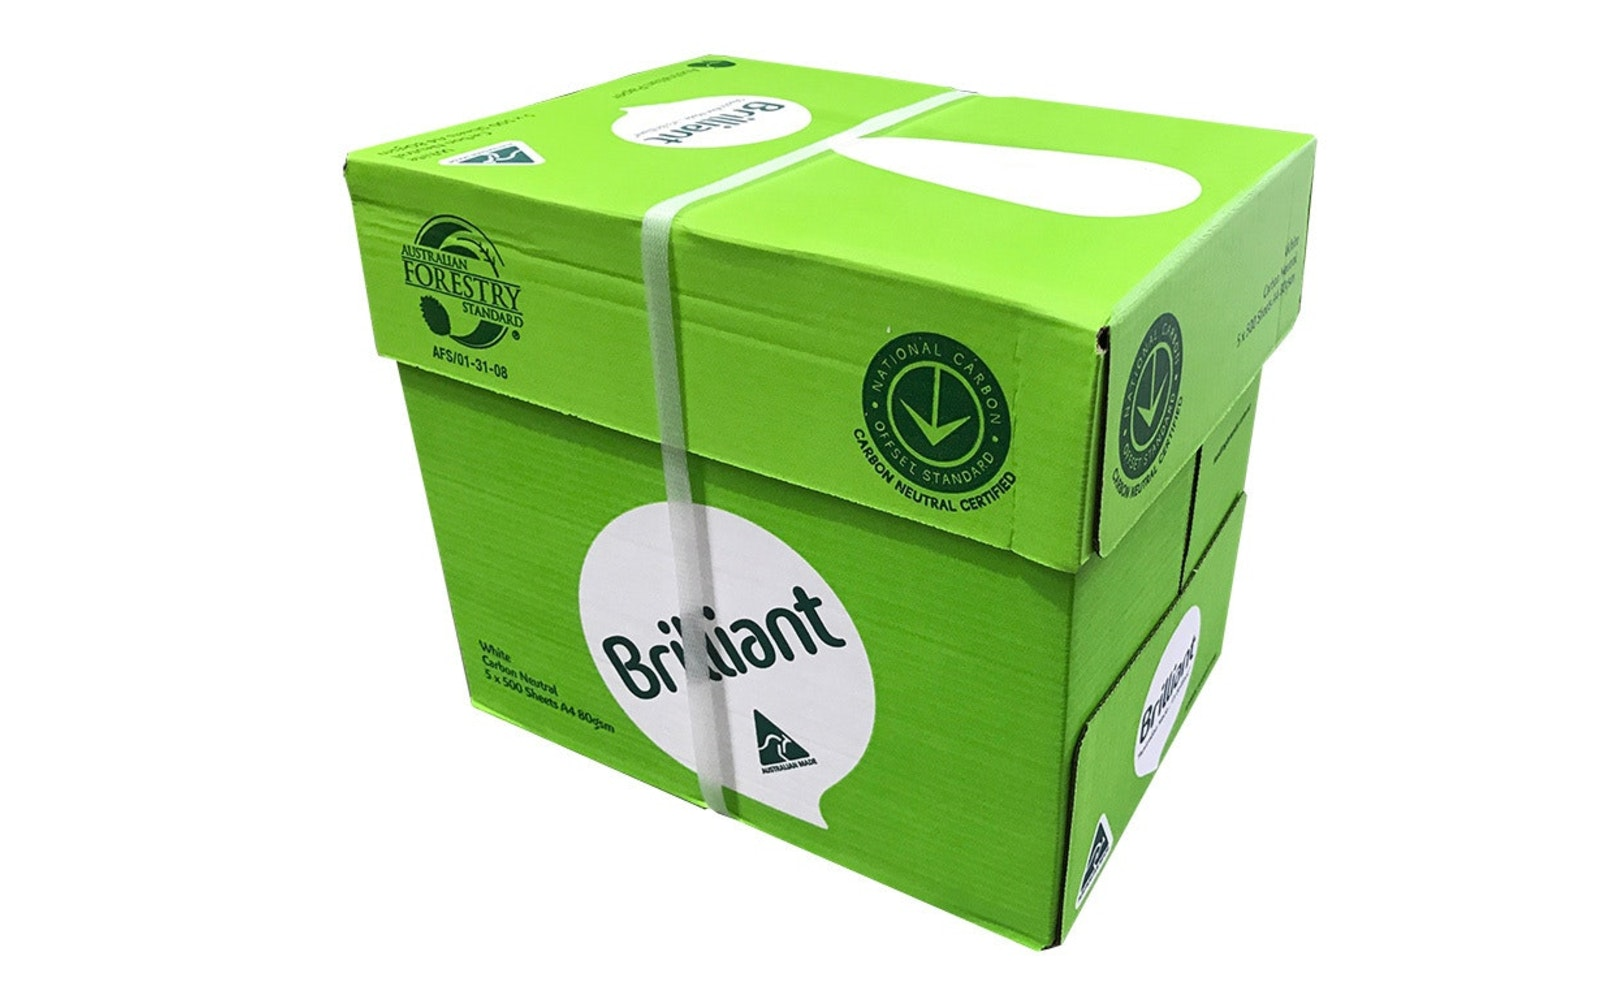 Brilliant A4 1 Carton 5 Reams 80gsm 500 Sheet Copy Paper A4 Paper By Cartridge World Australia